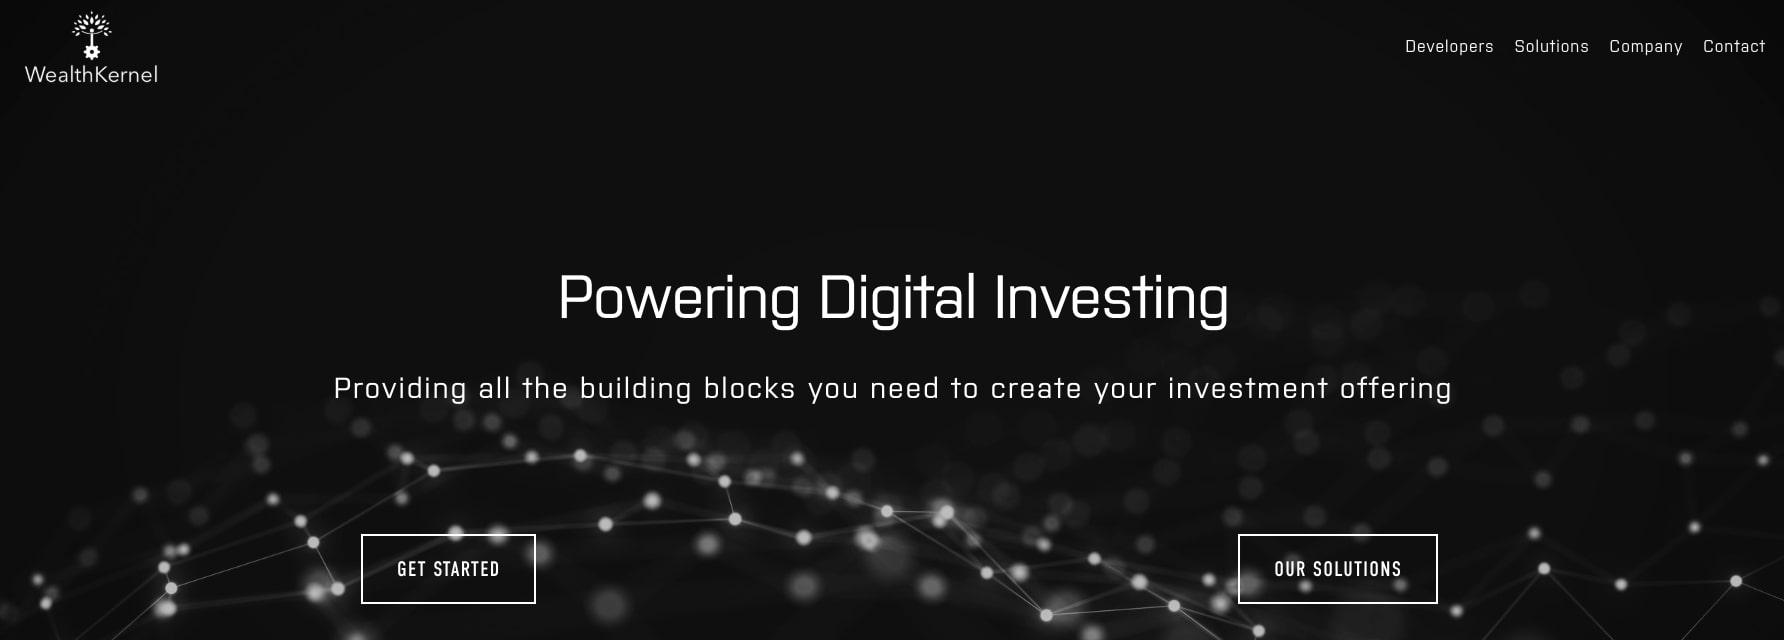 WealthKernel FinTech Website Homepage